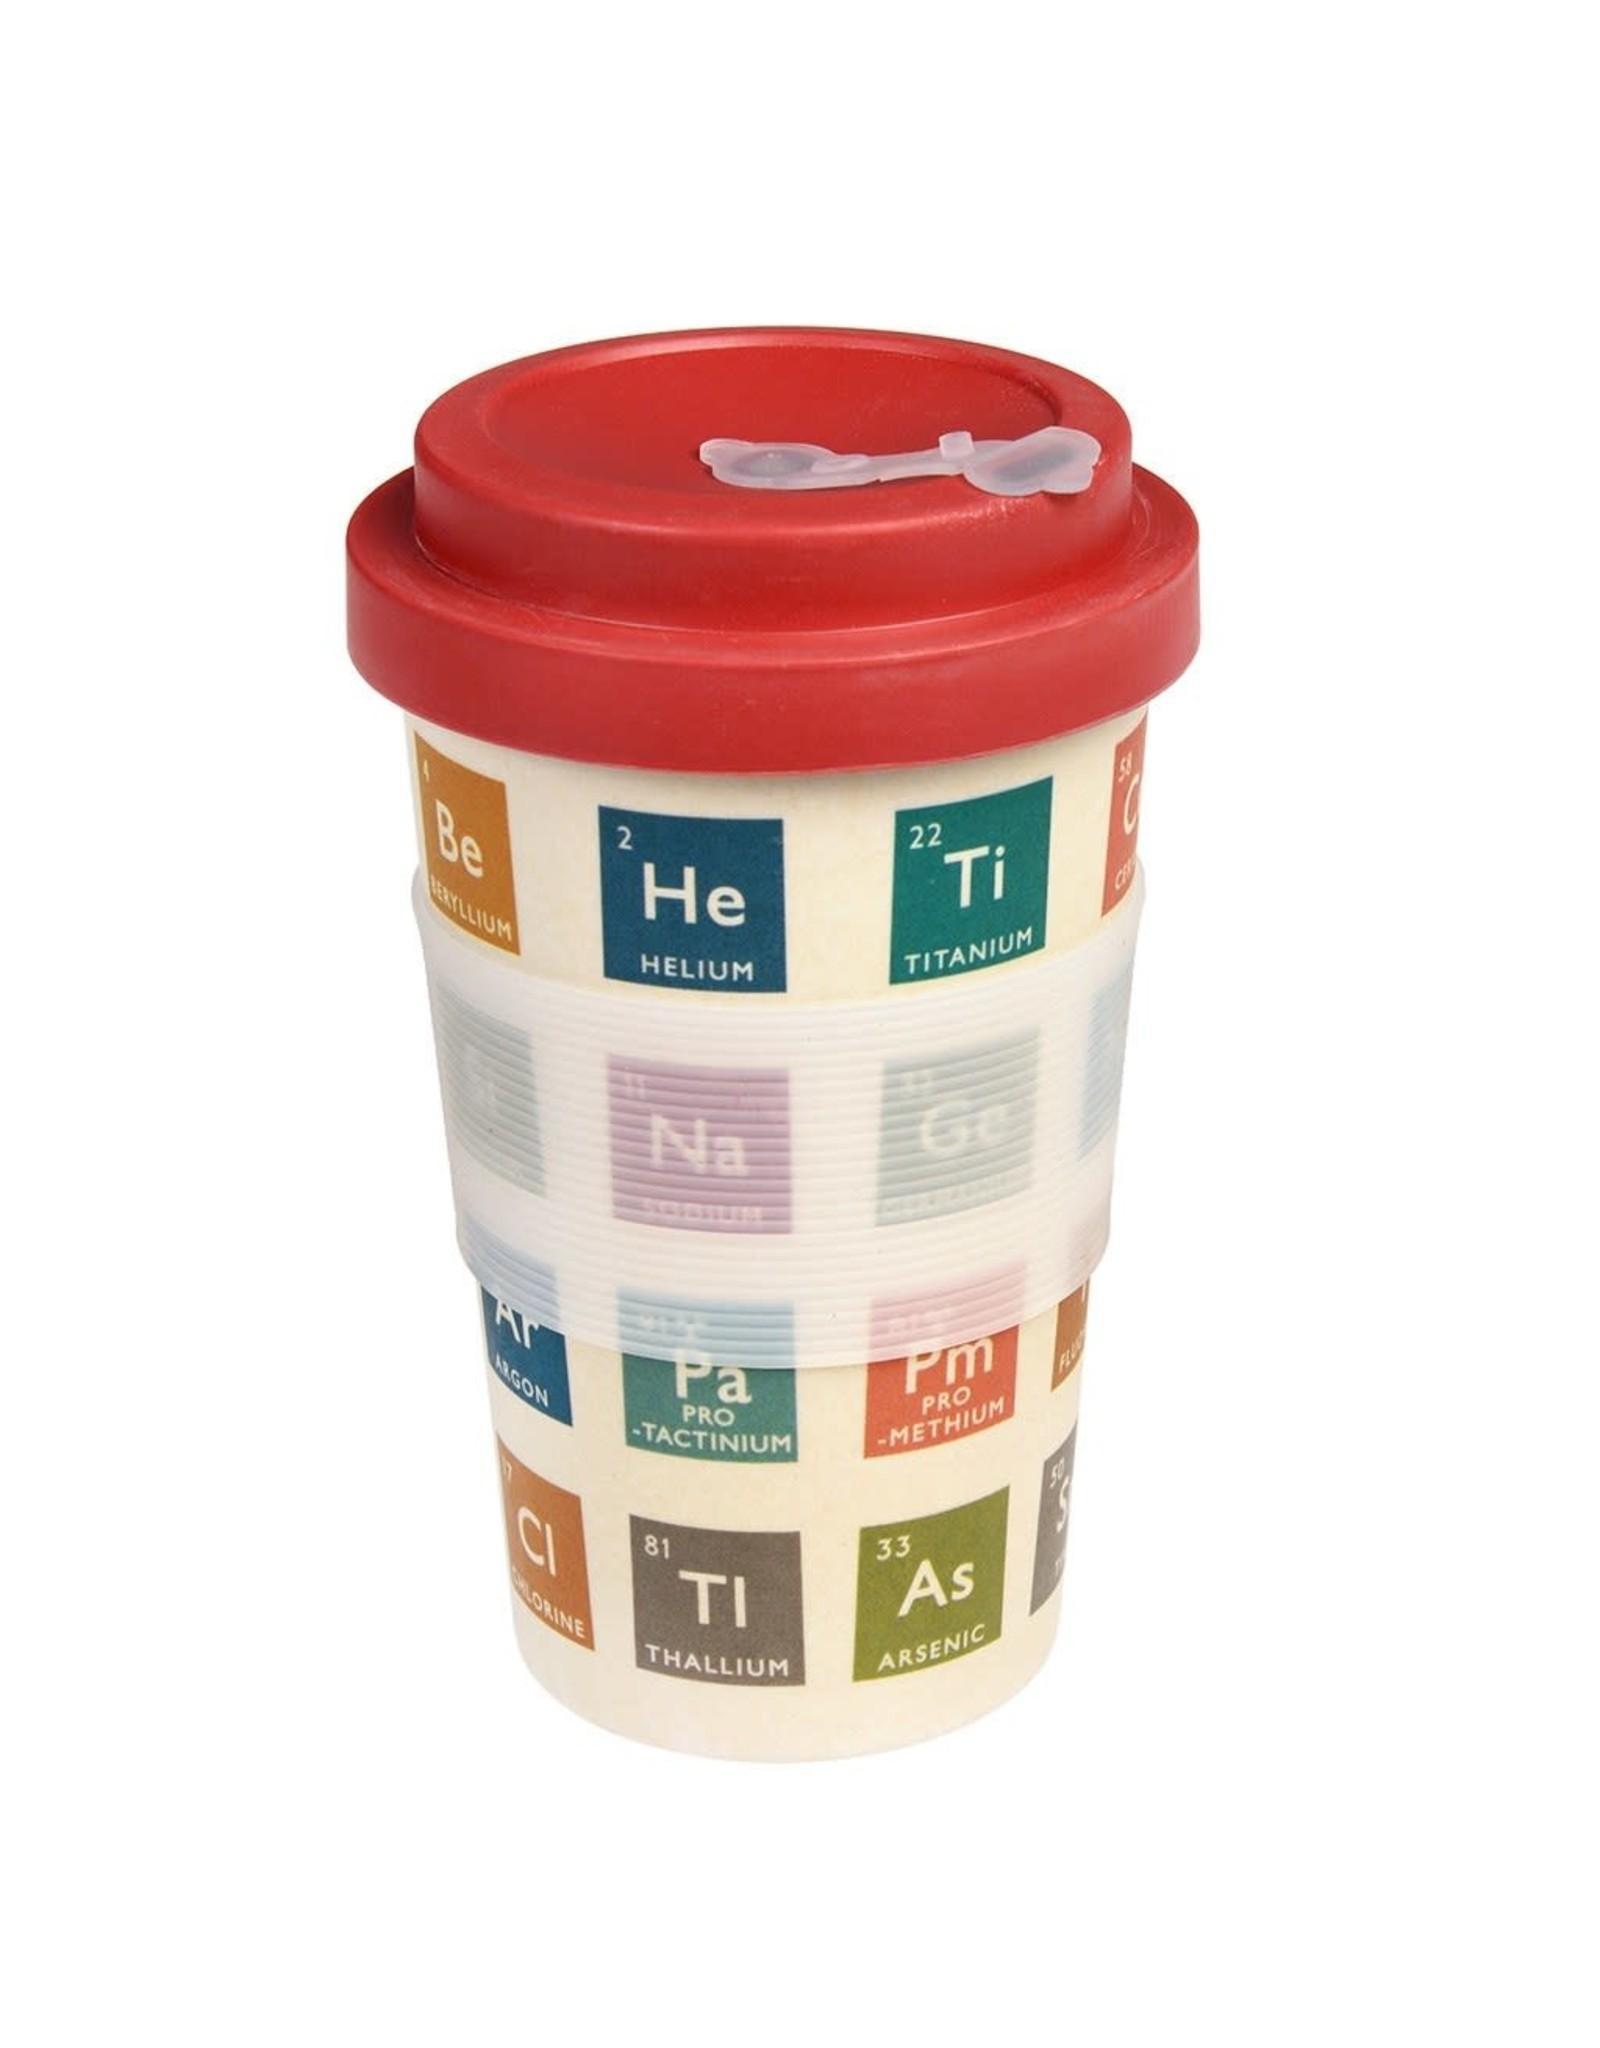 REX London Reusable Bamboo Travel Mug, Periodic Table